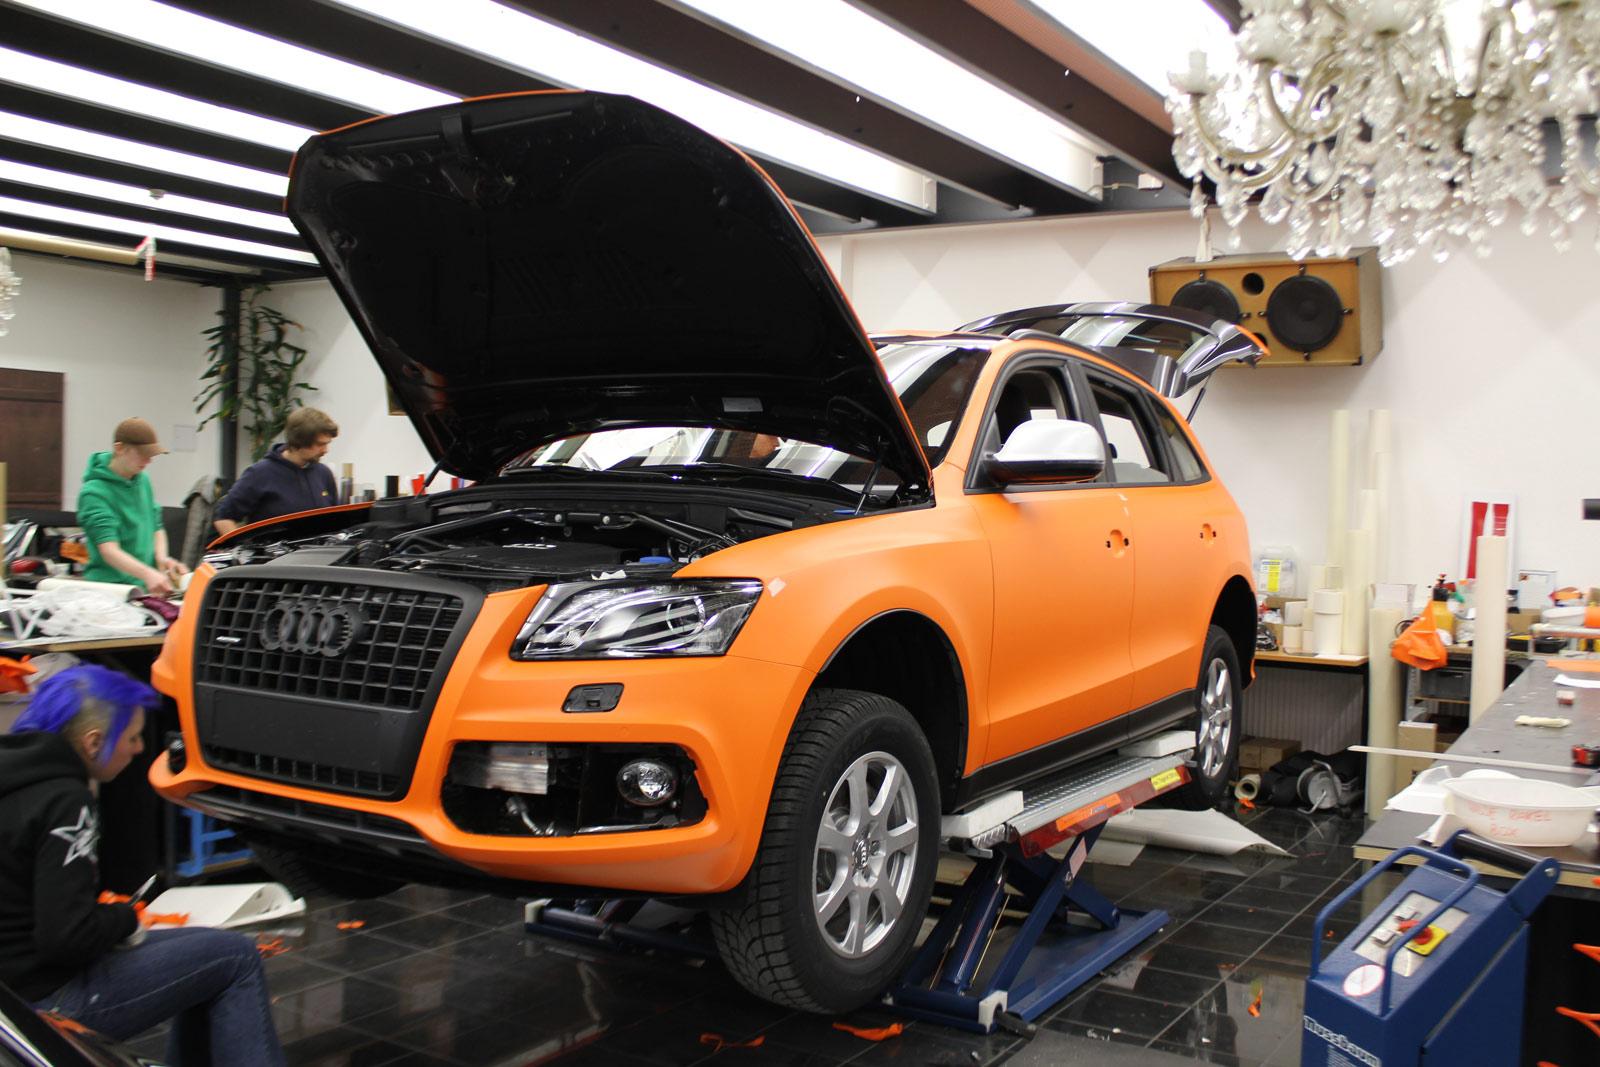 Audi_Q5_Folierung_Orange_Matt_06